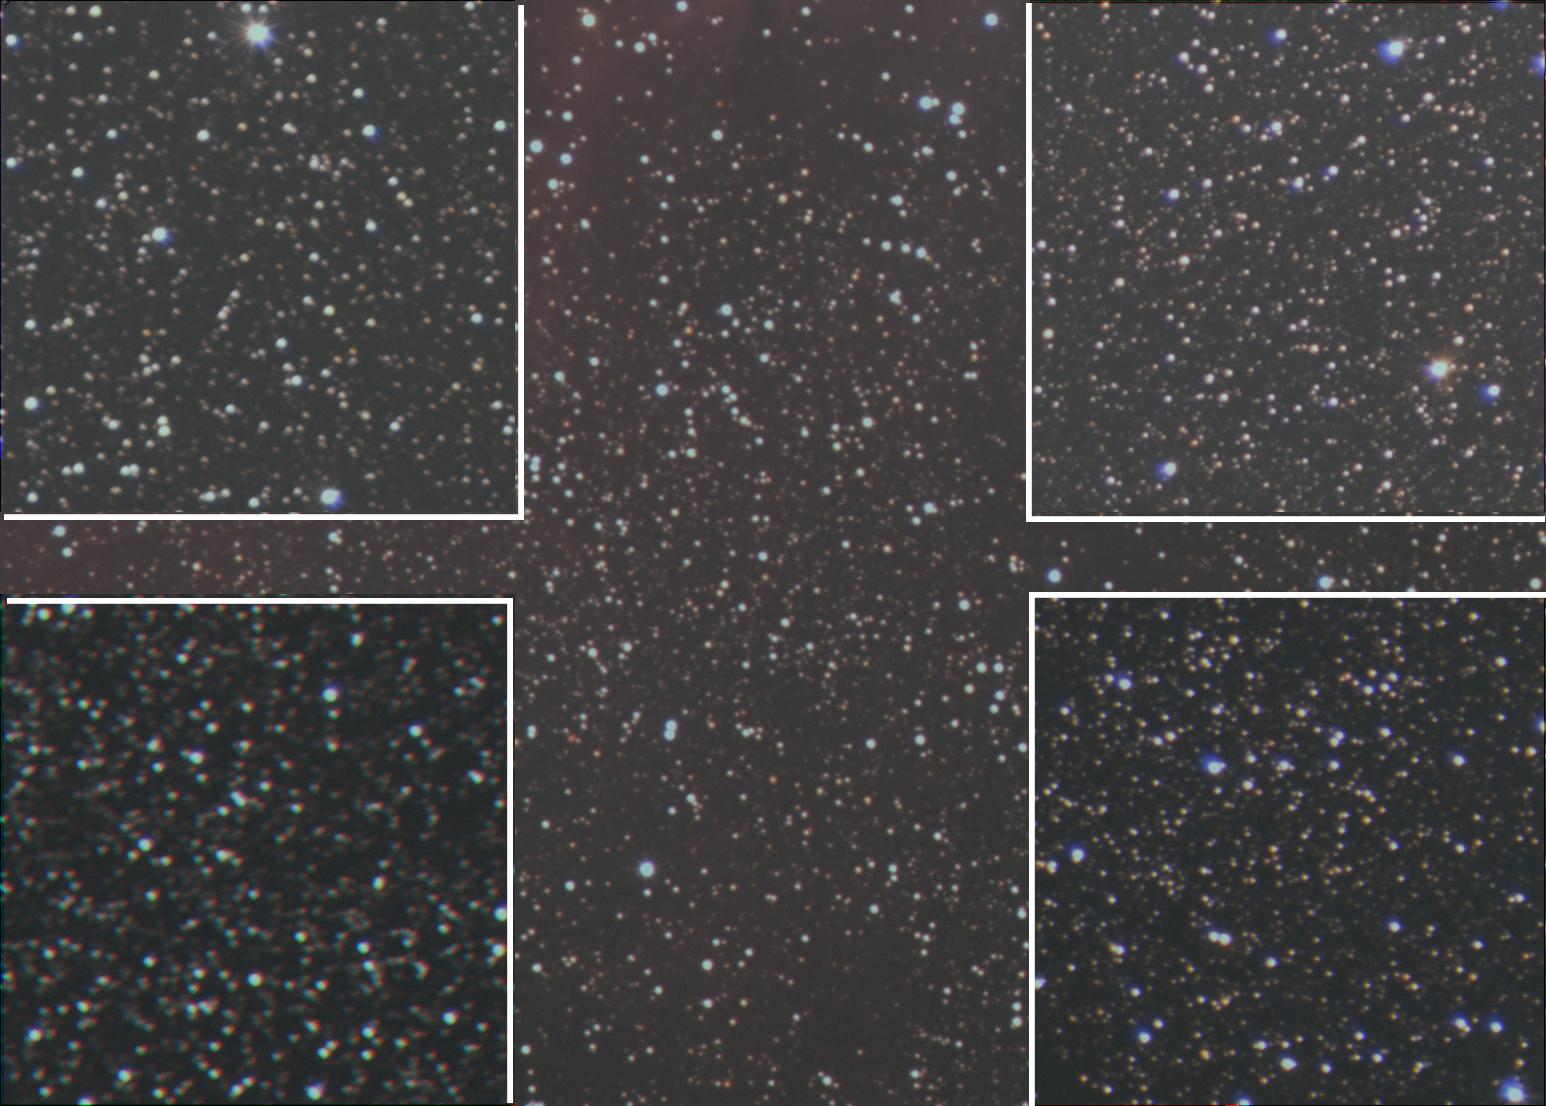 f:id:snct-astro:20180615132008j:plain